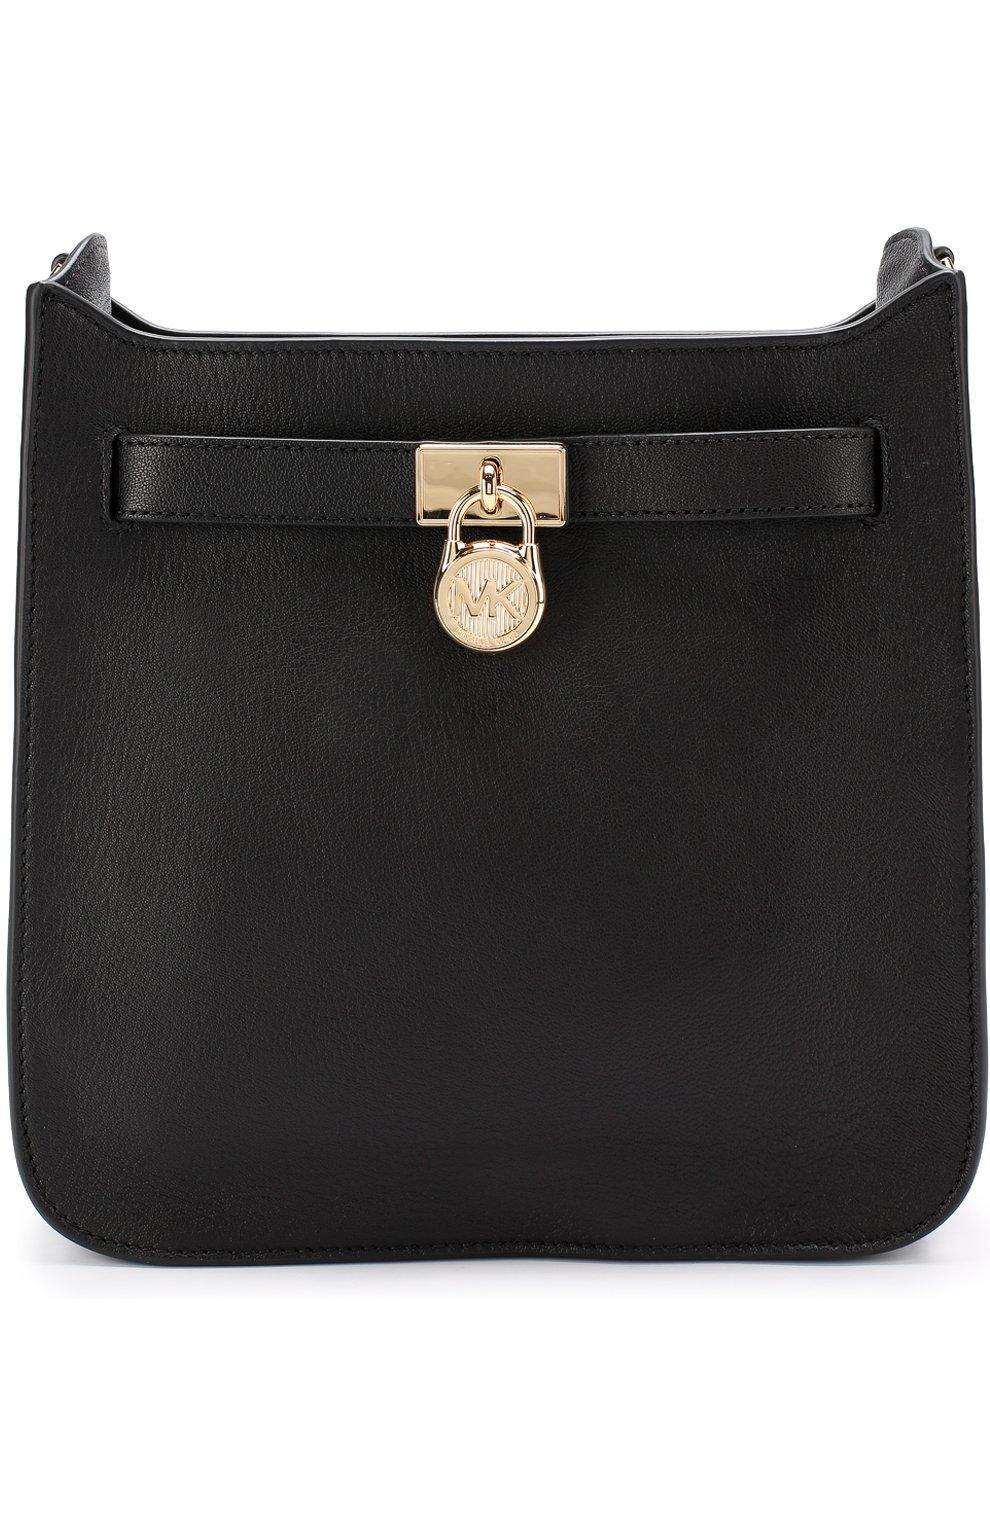 0e504b426dae Женская сумка hamilton MICHAEL MICHAEL KORS черная цвета — купить за ...